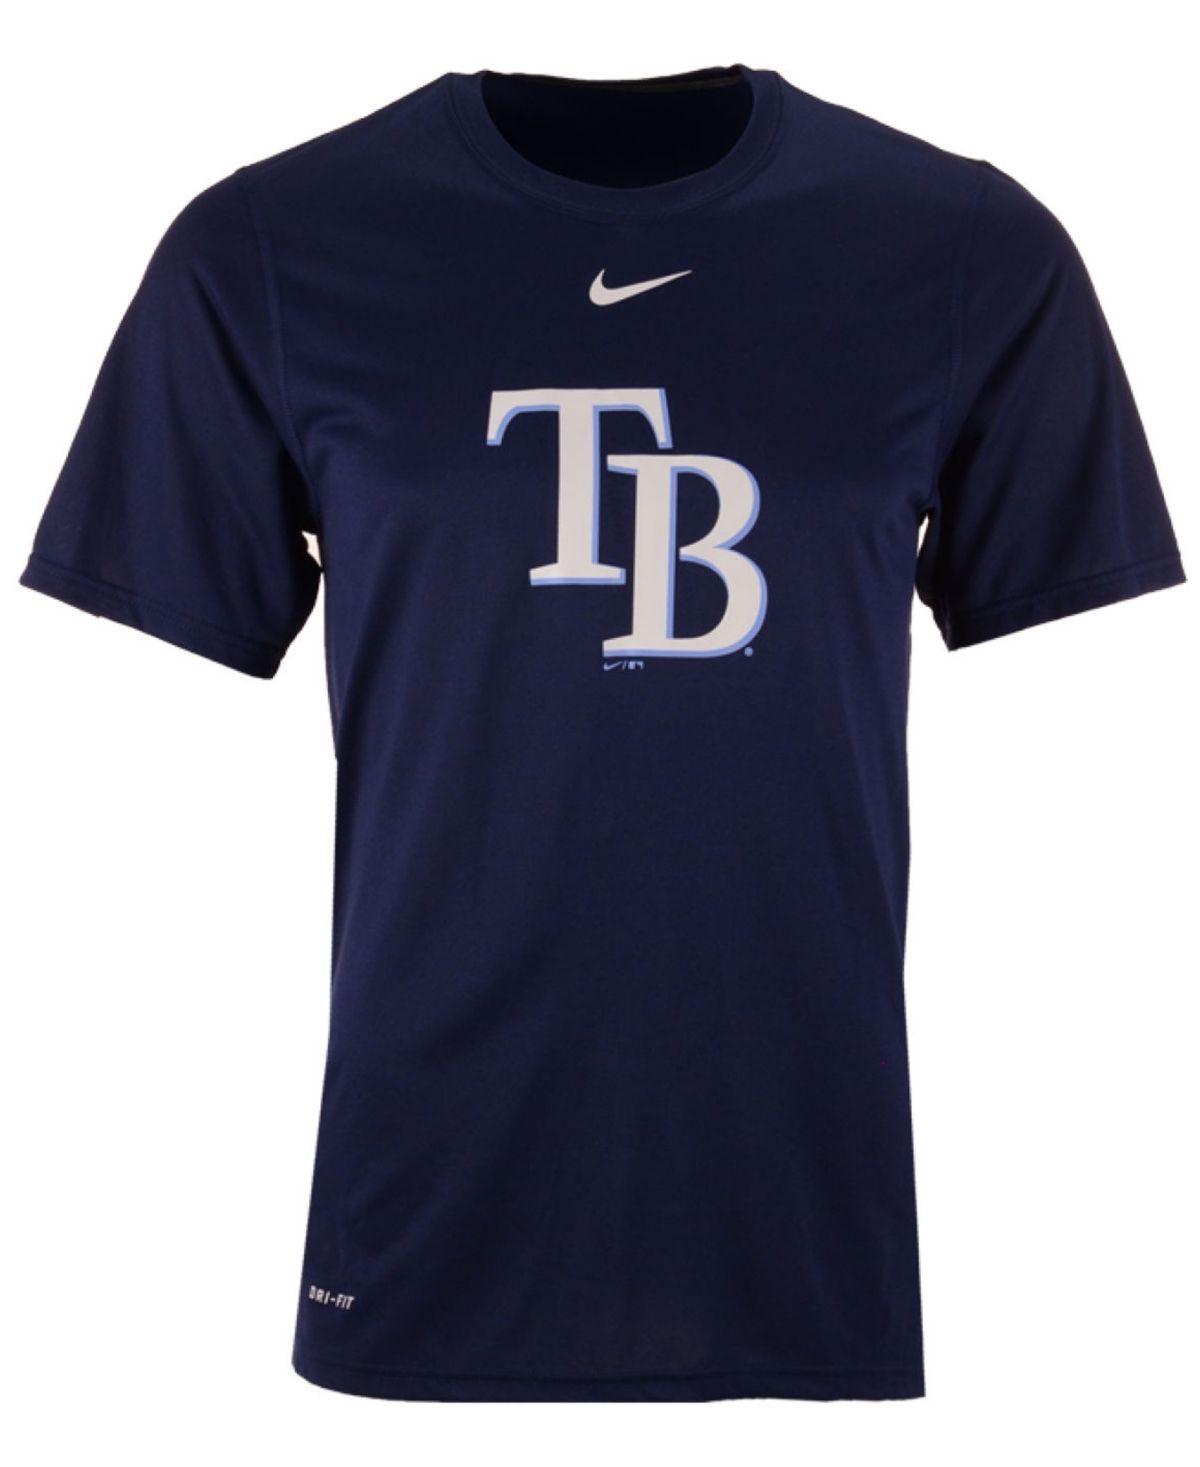 Nike Men's Tampa Bay Rays Bp Logo Legend TShirt Navy